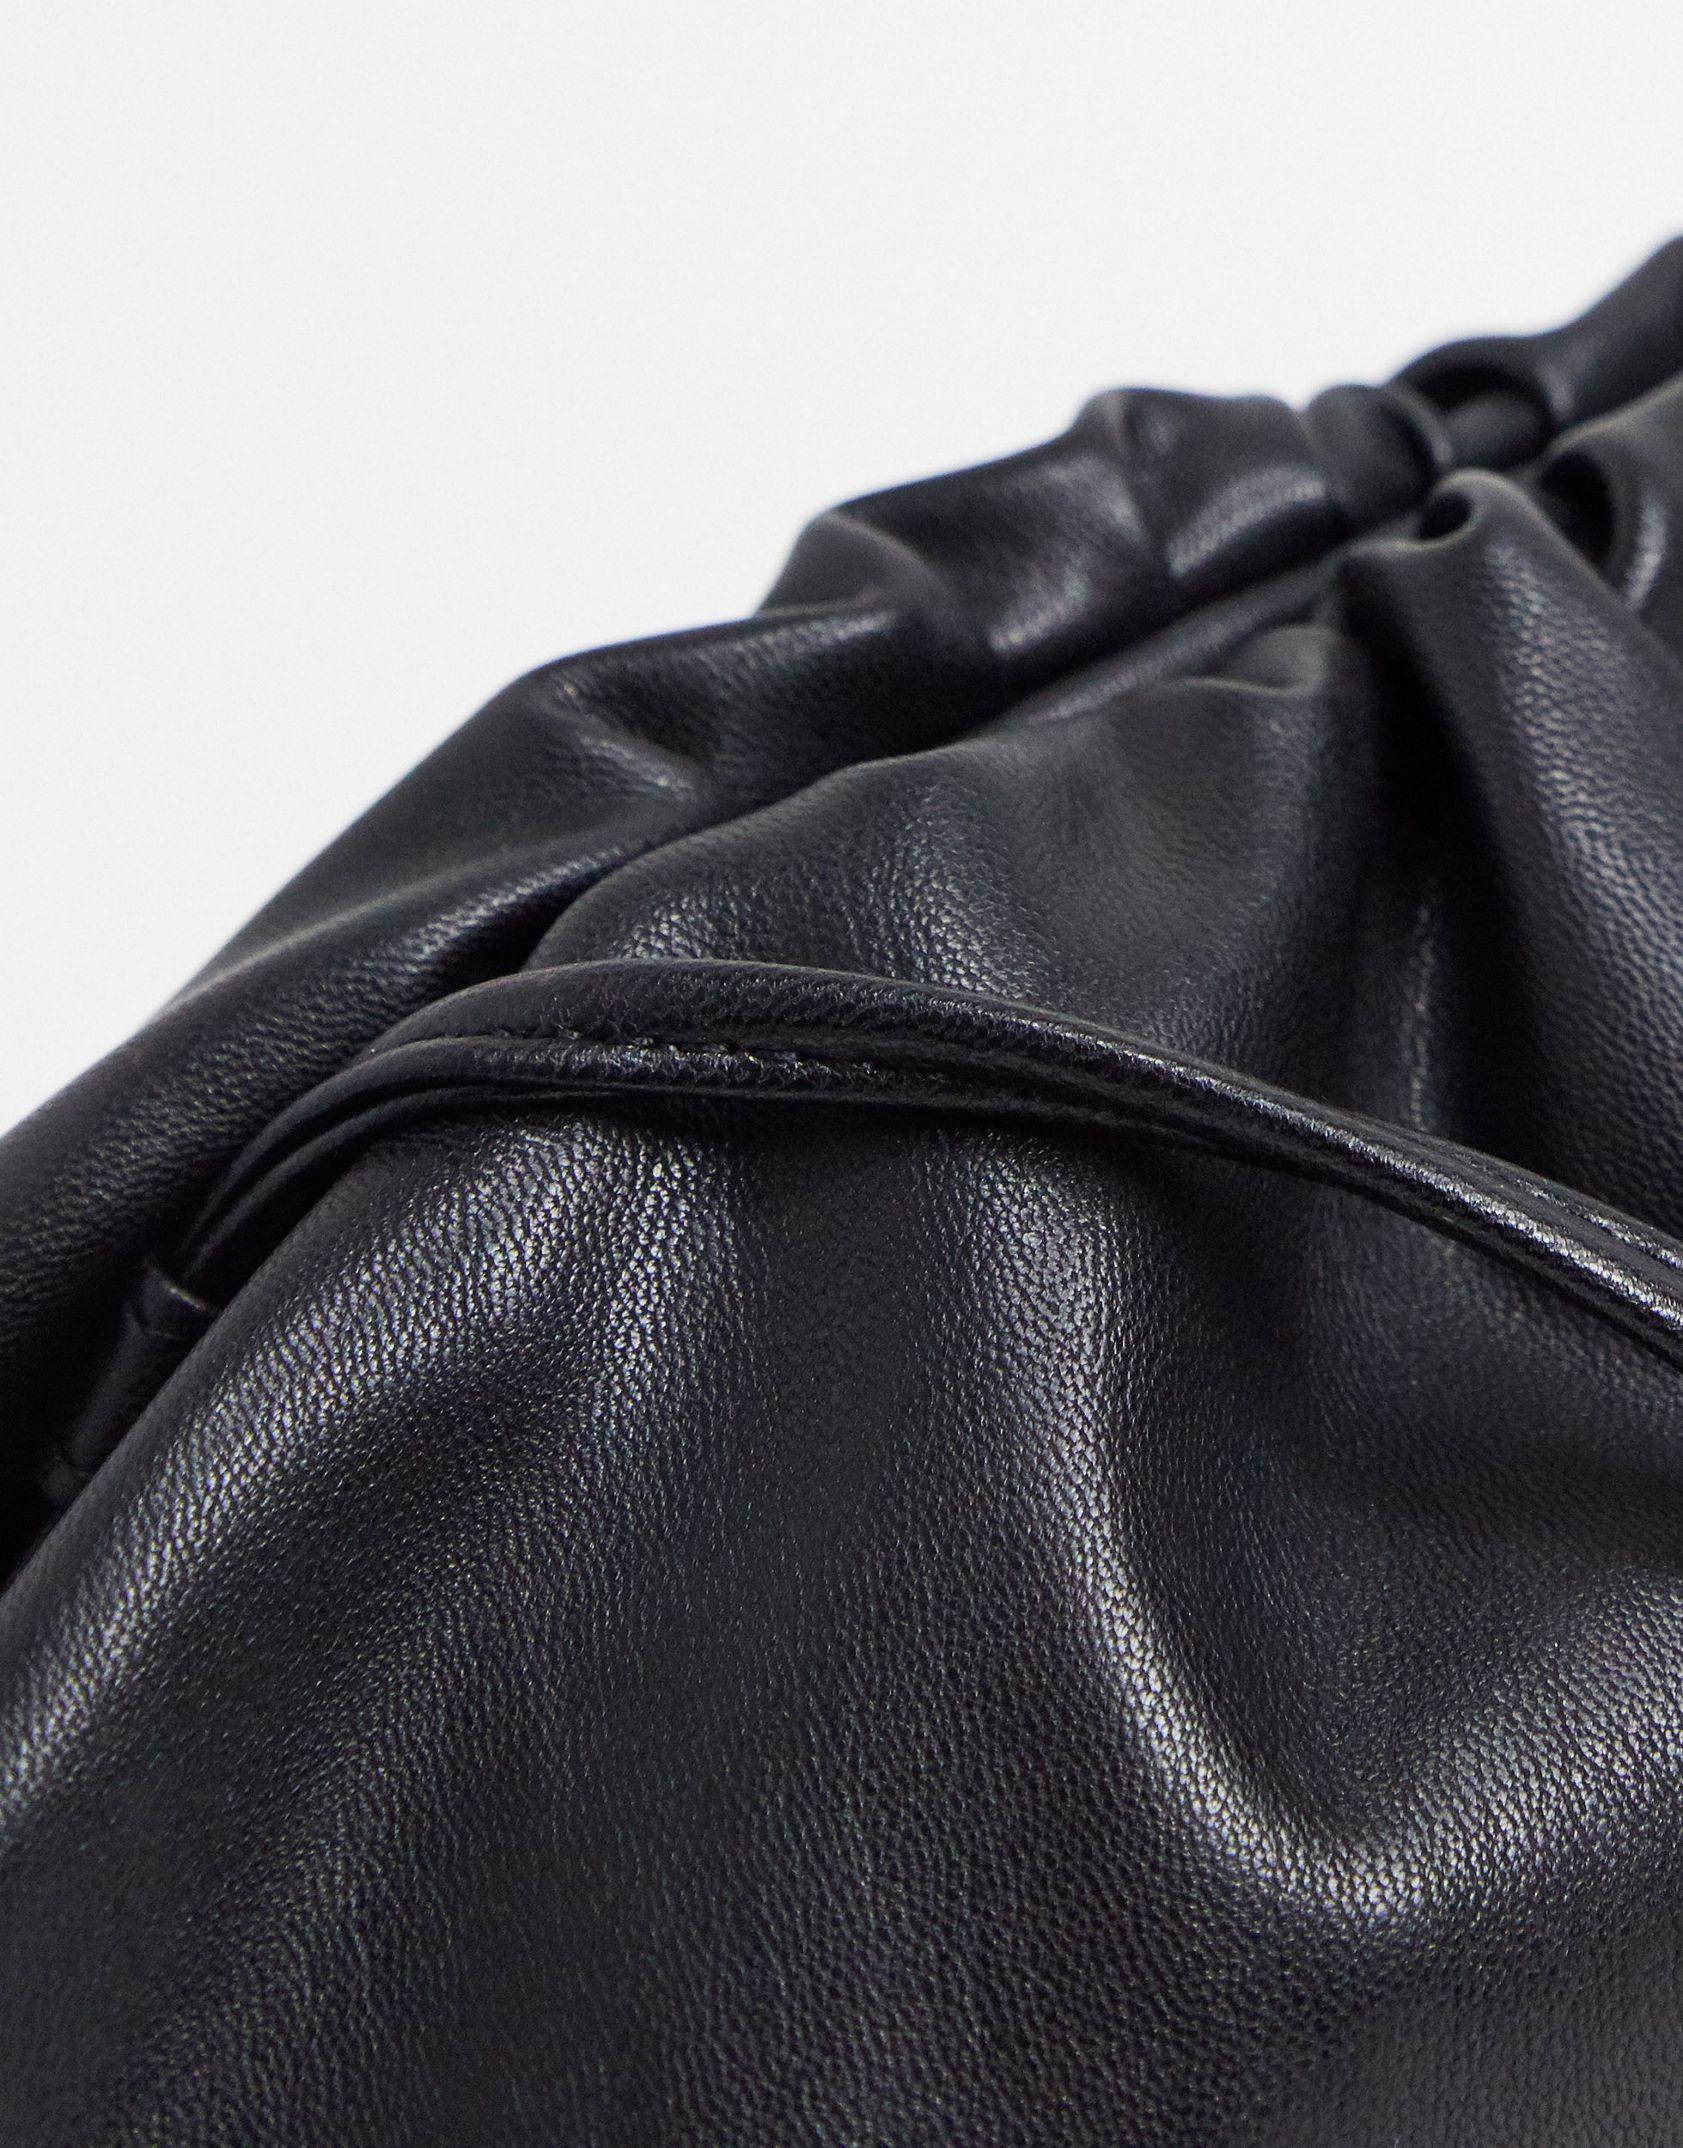 New Look pillow bag in black - ASOS Price Checker